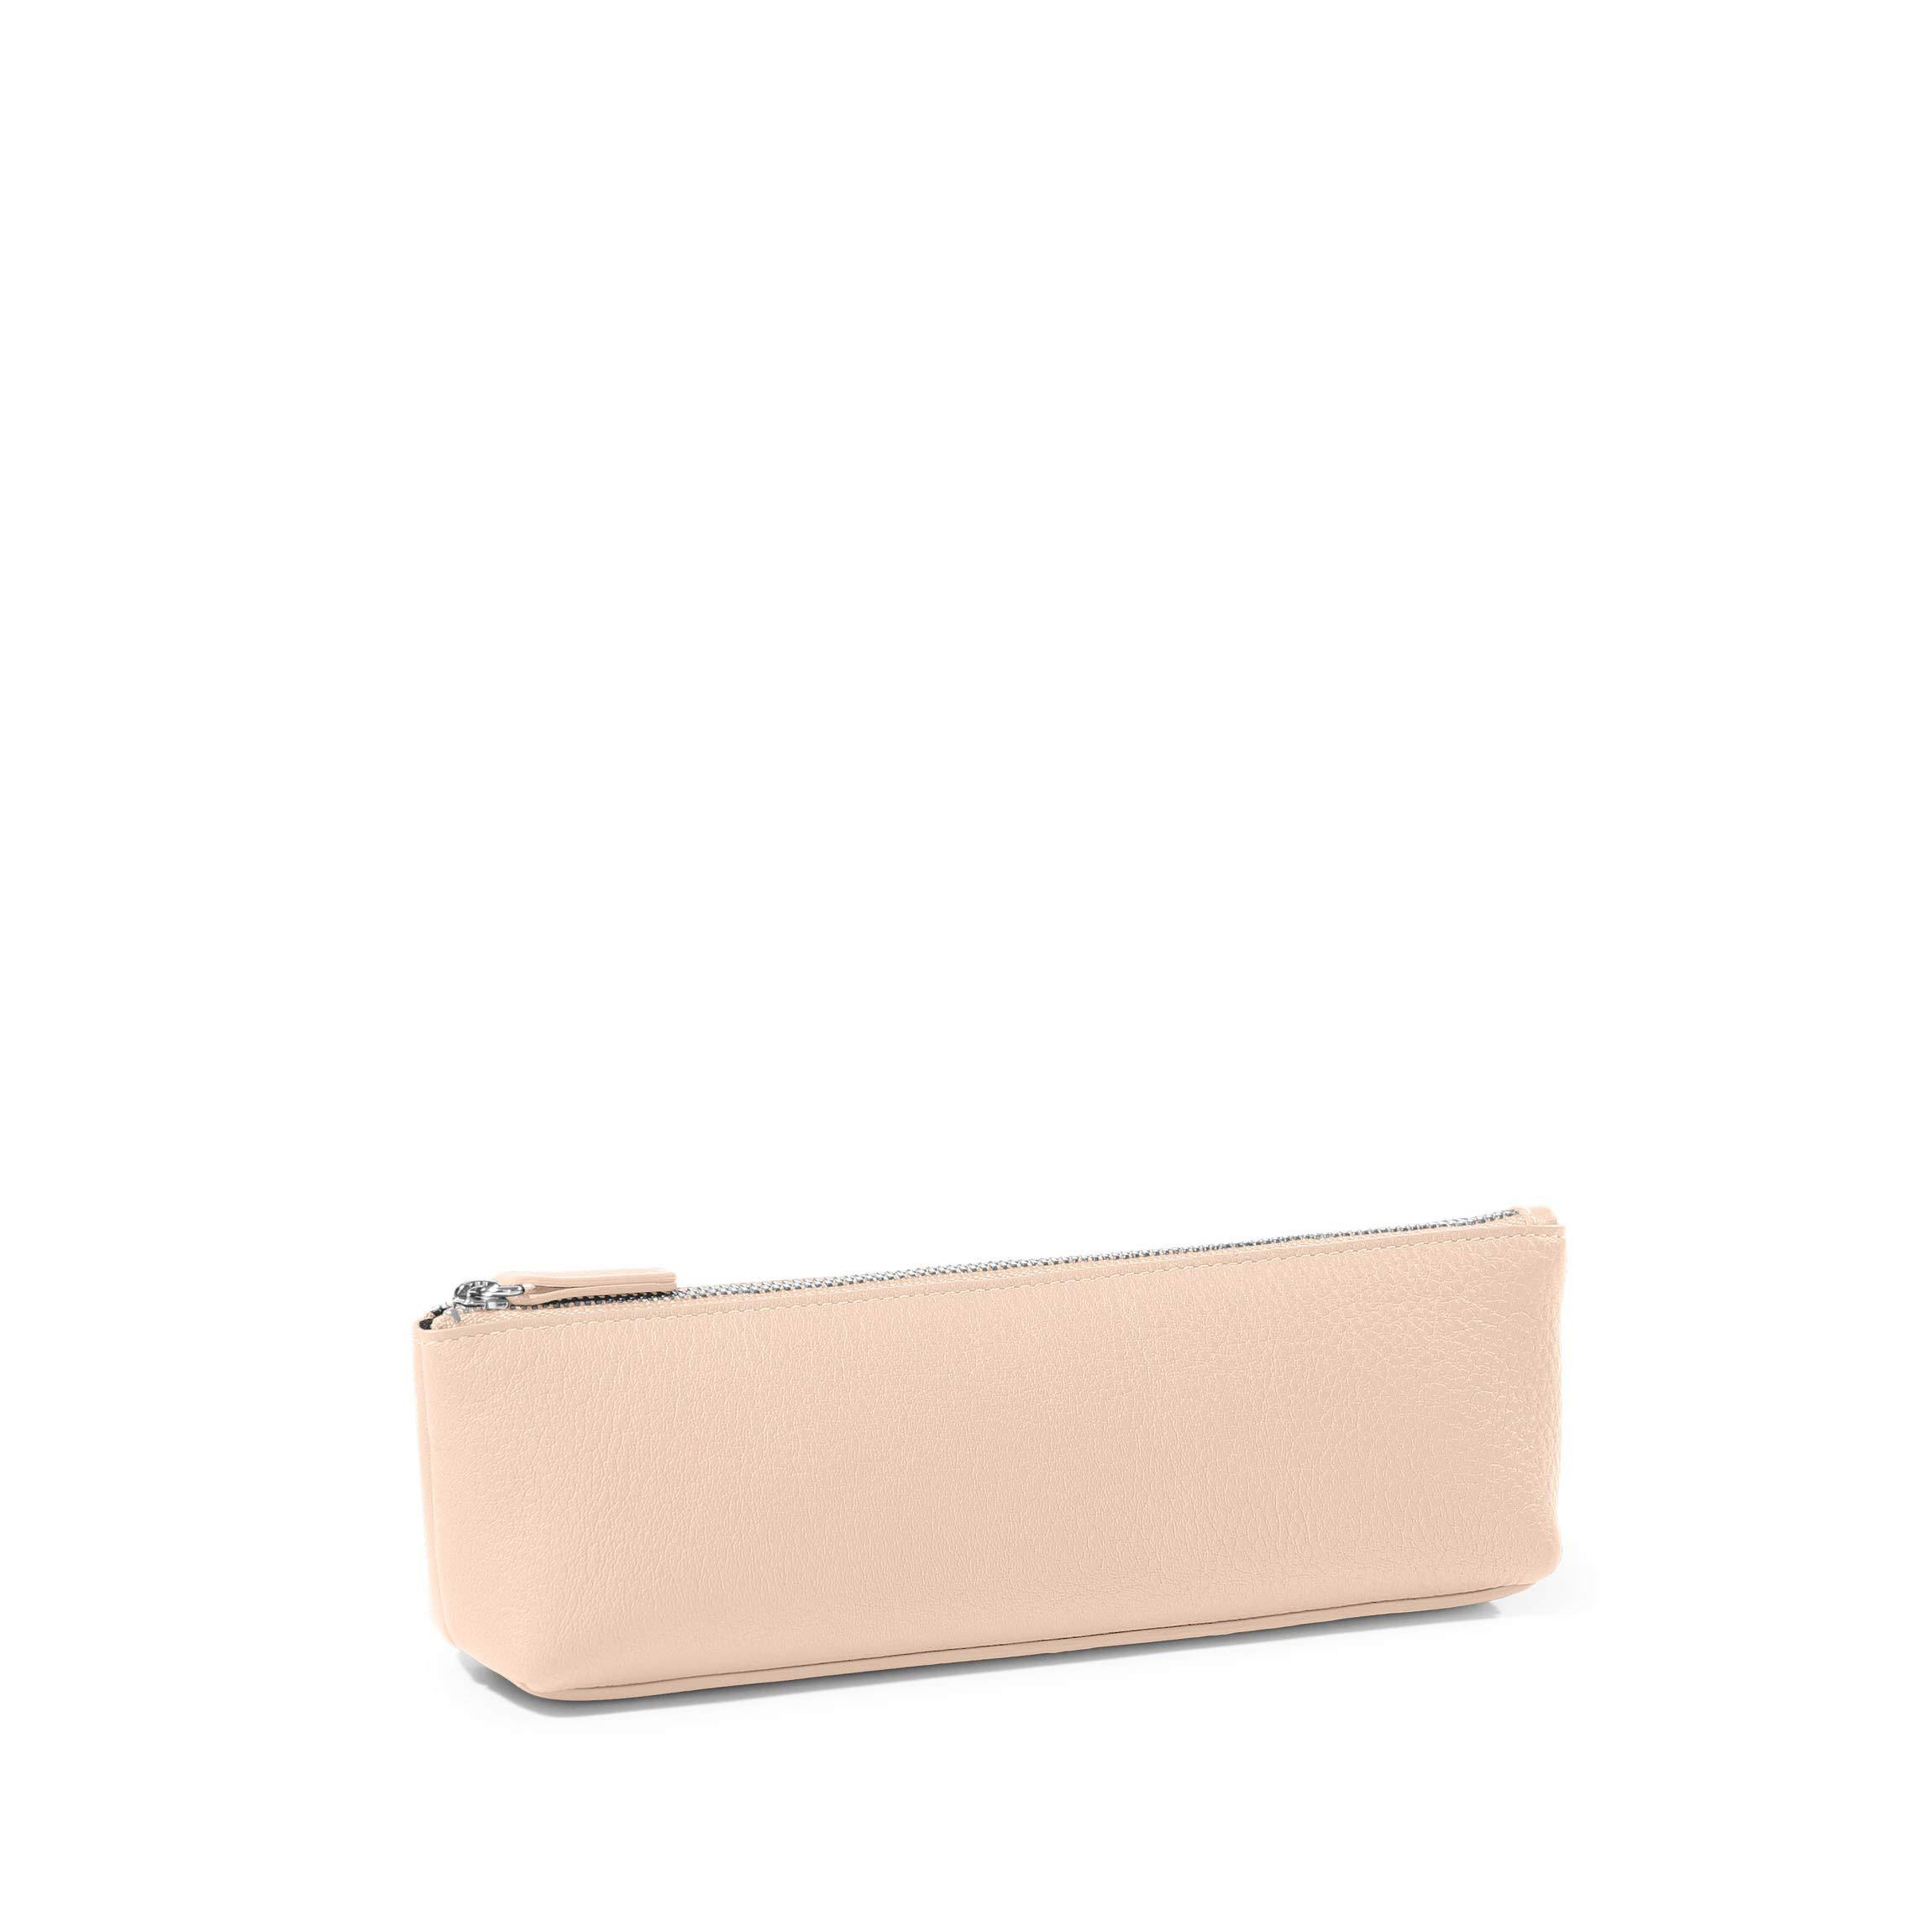 Leatherology Rose Pencil Case by Leatherology